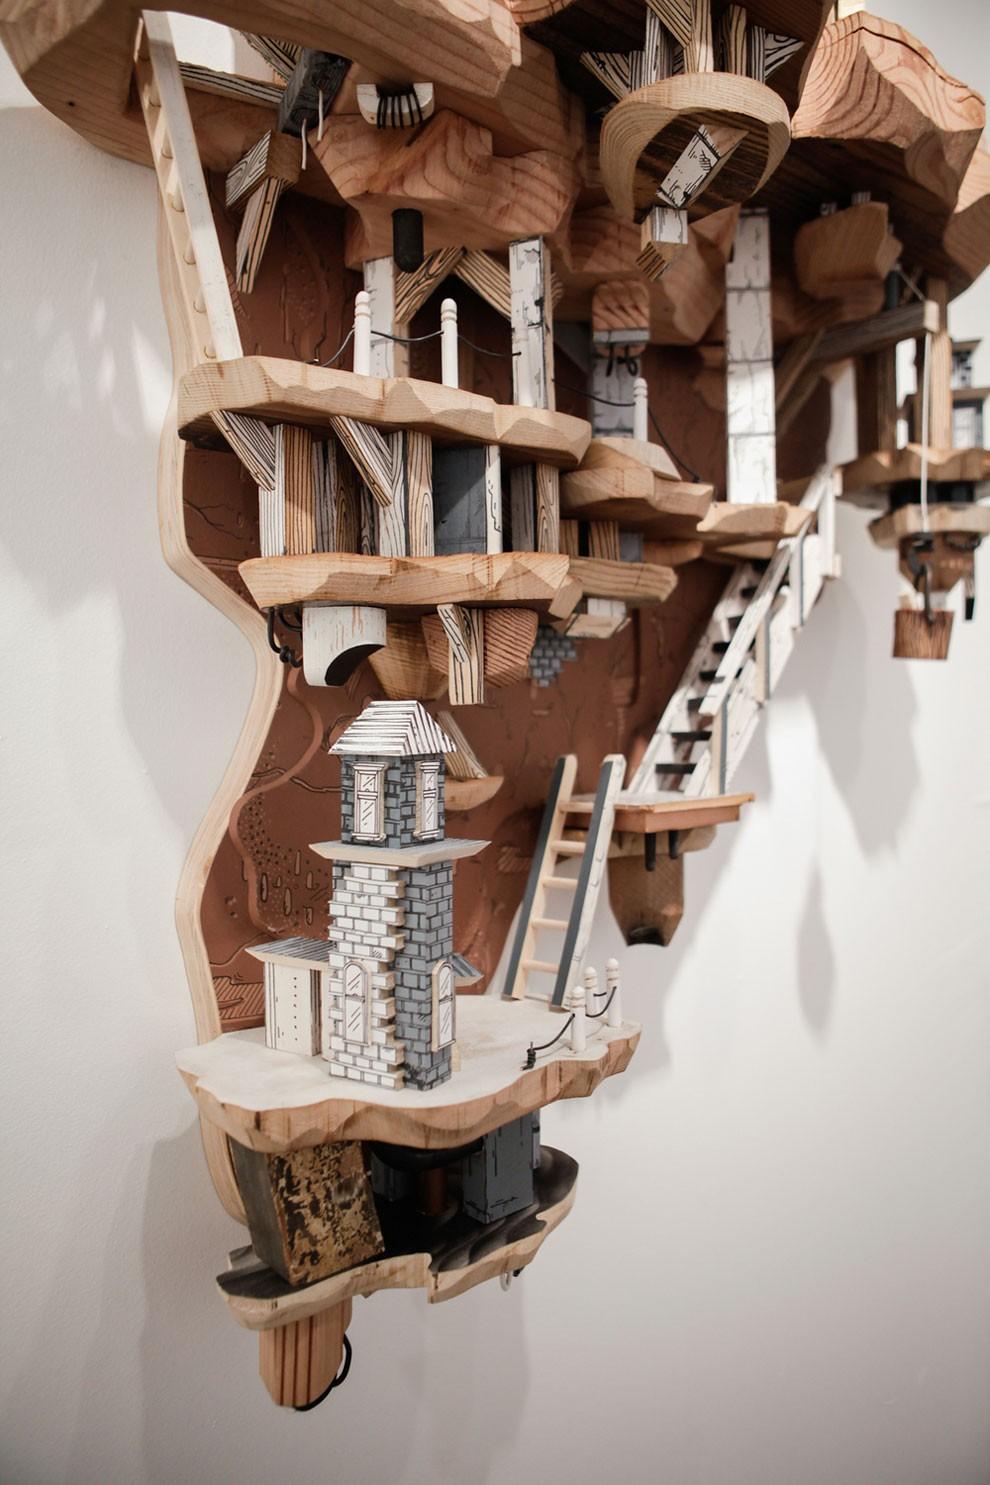 illustrazioni-scultura-mondi-miniatura-architettura-luke-o-sullivan-02